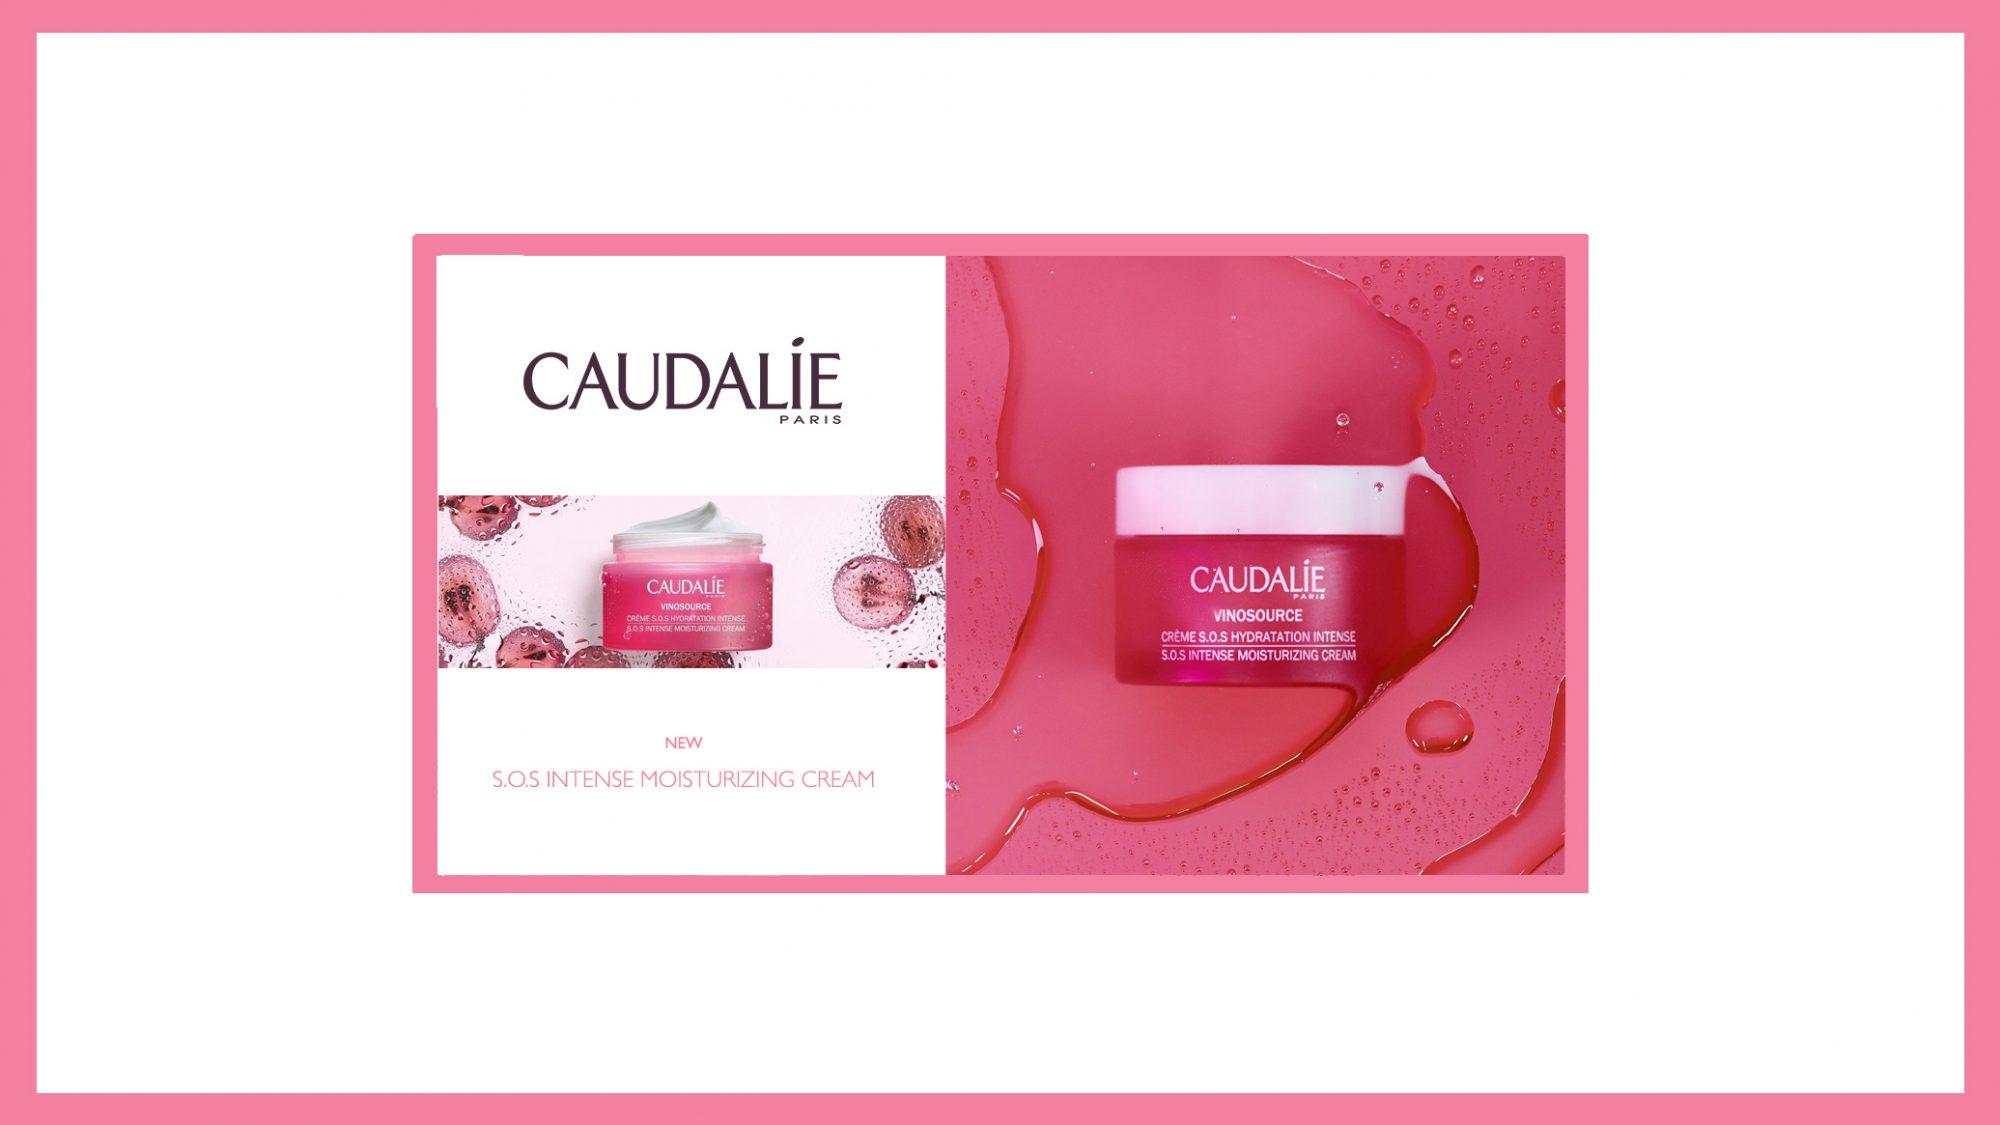 Caudalie SOS Intense Moisturizing Cream Pink Banner Visual 2019